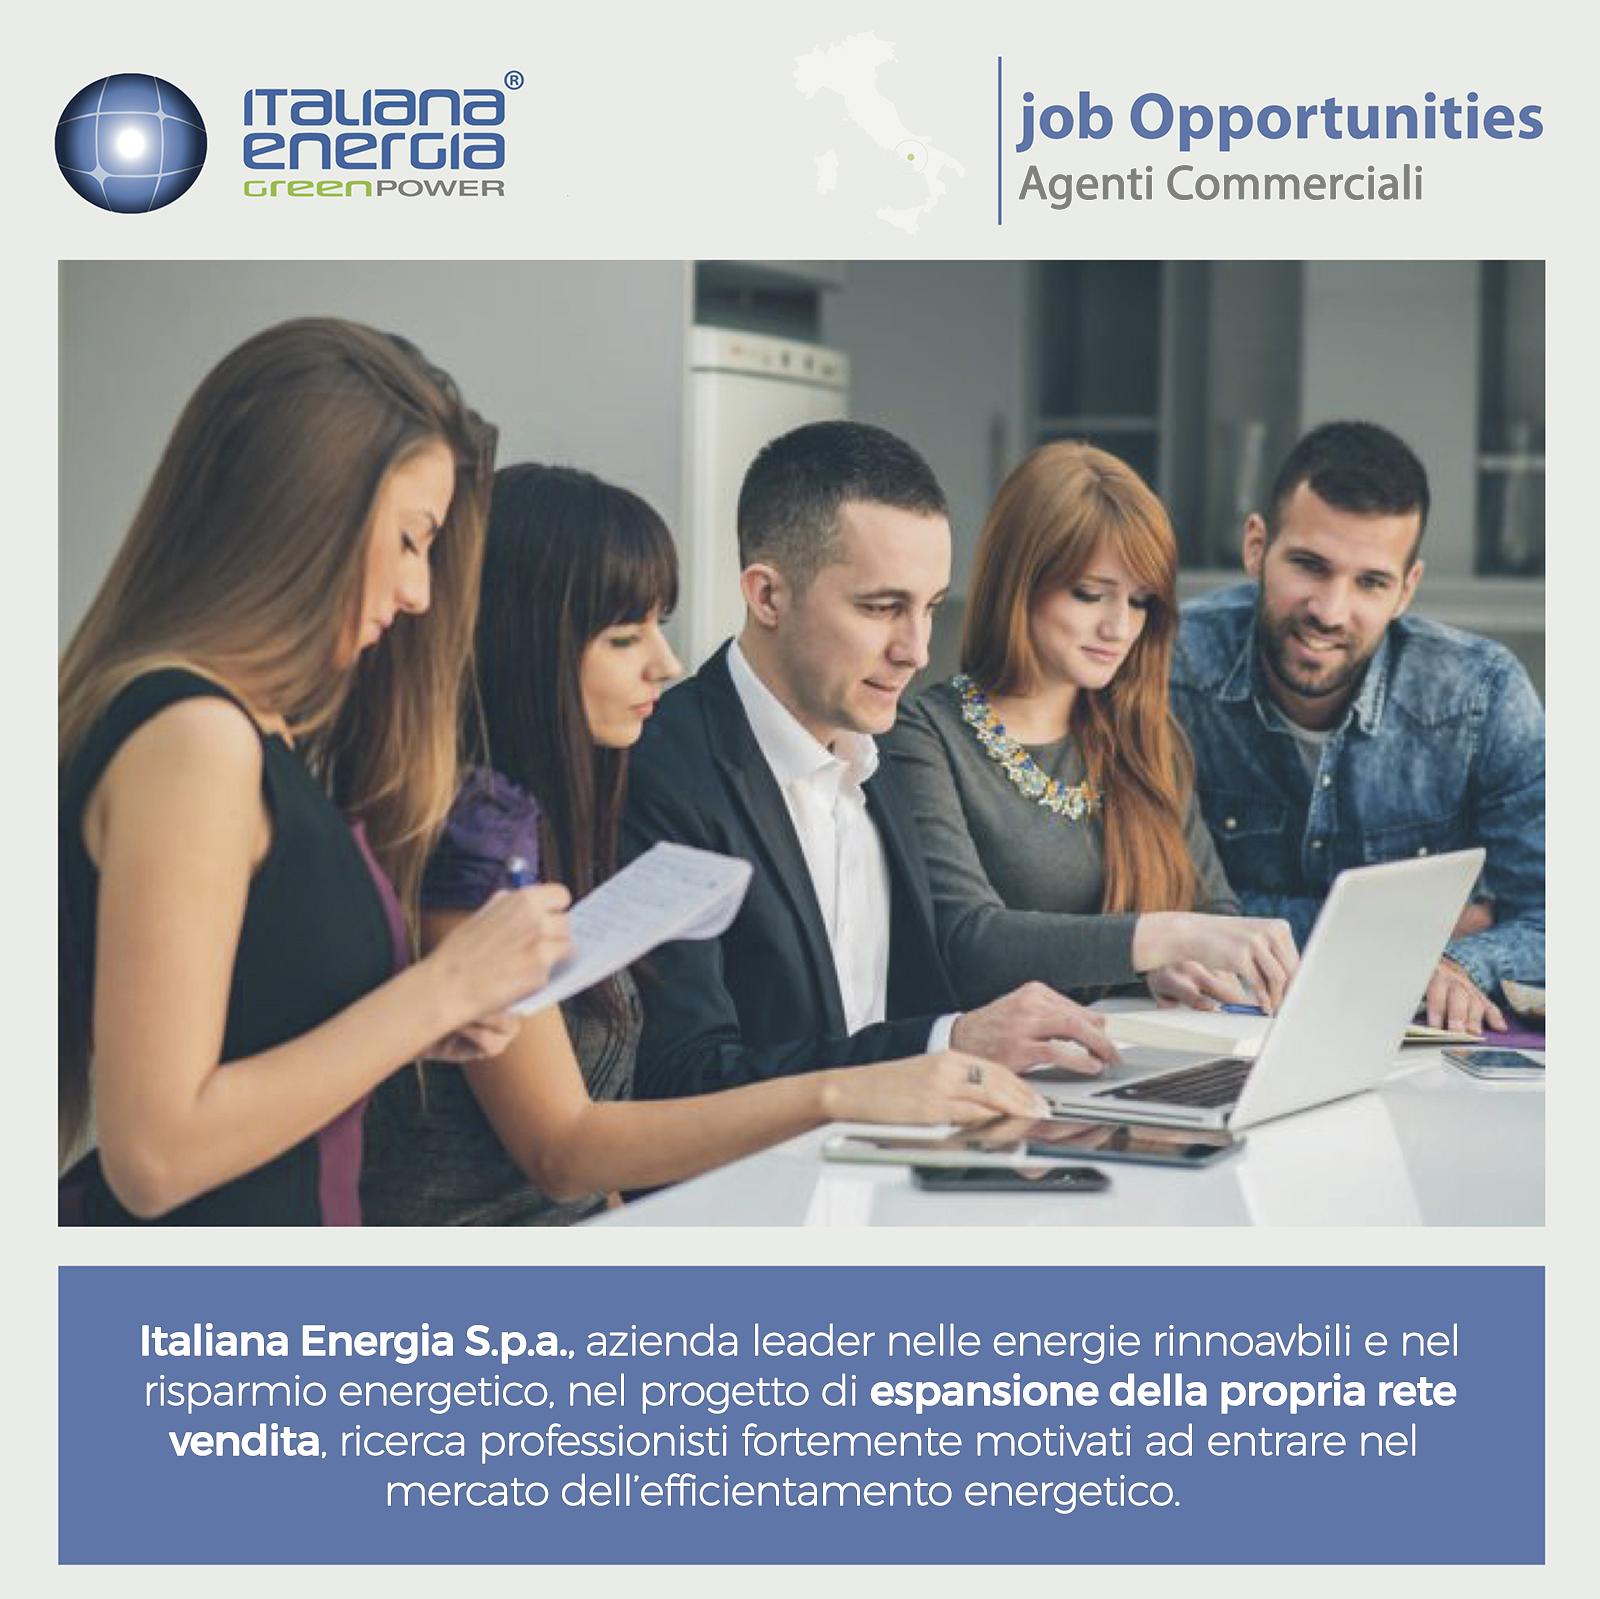 job opportunities_agenticommerciali